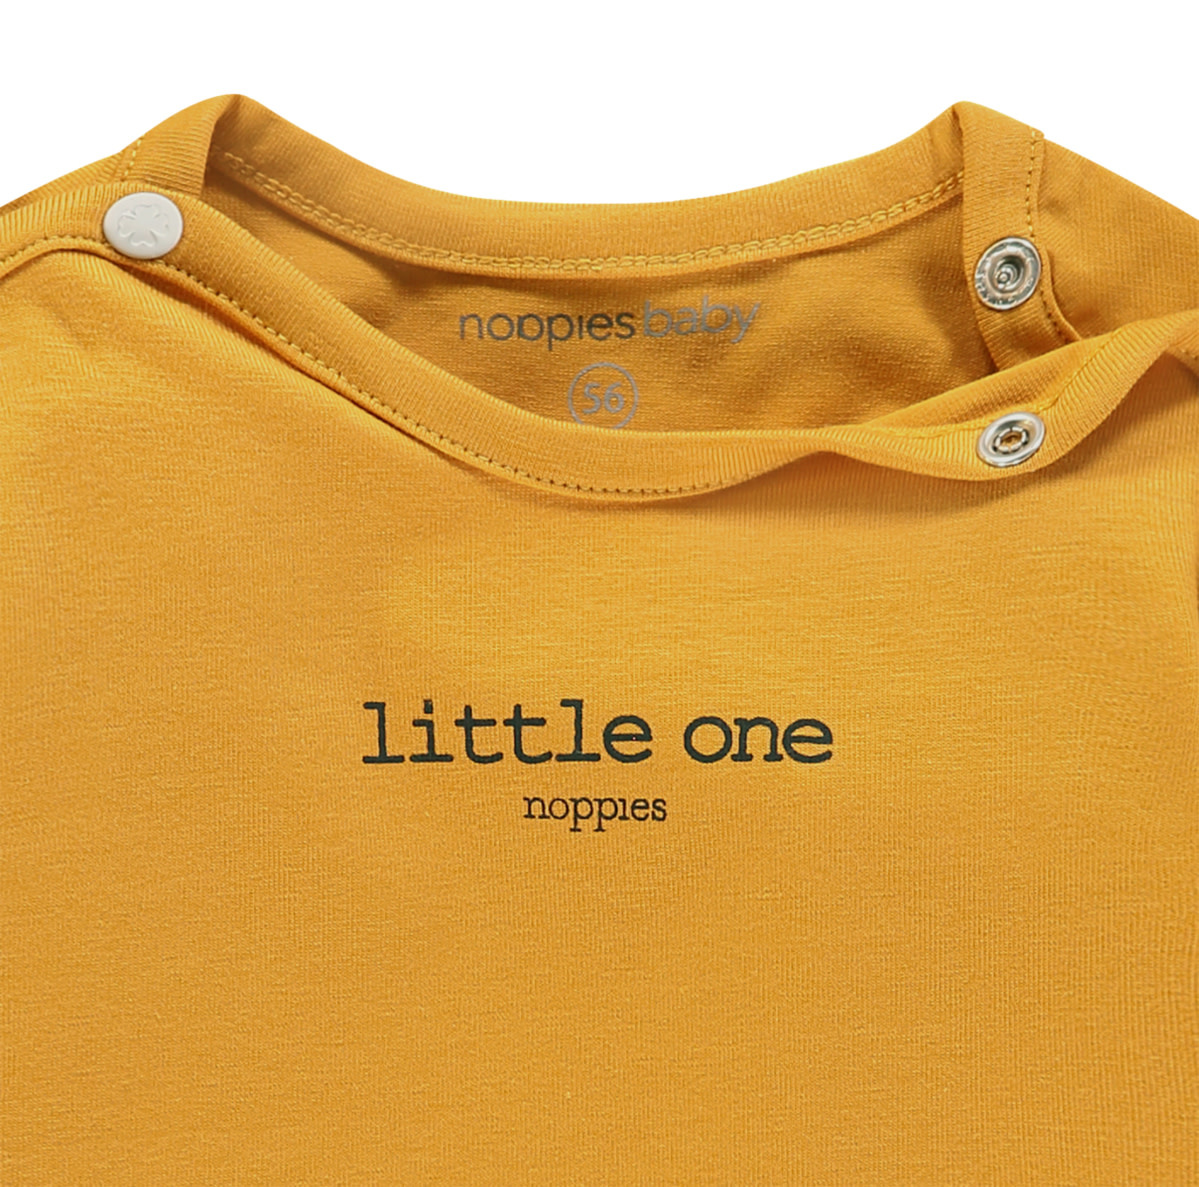 "Noppies Tee ""Little One"" Hony Yellow"